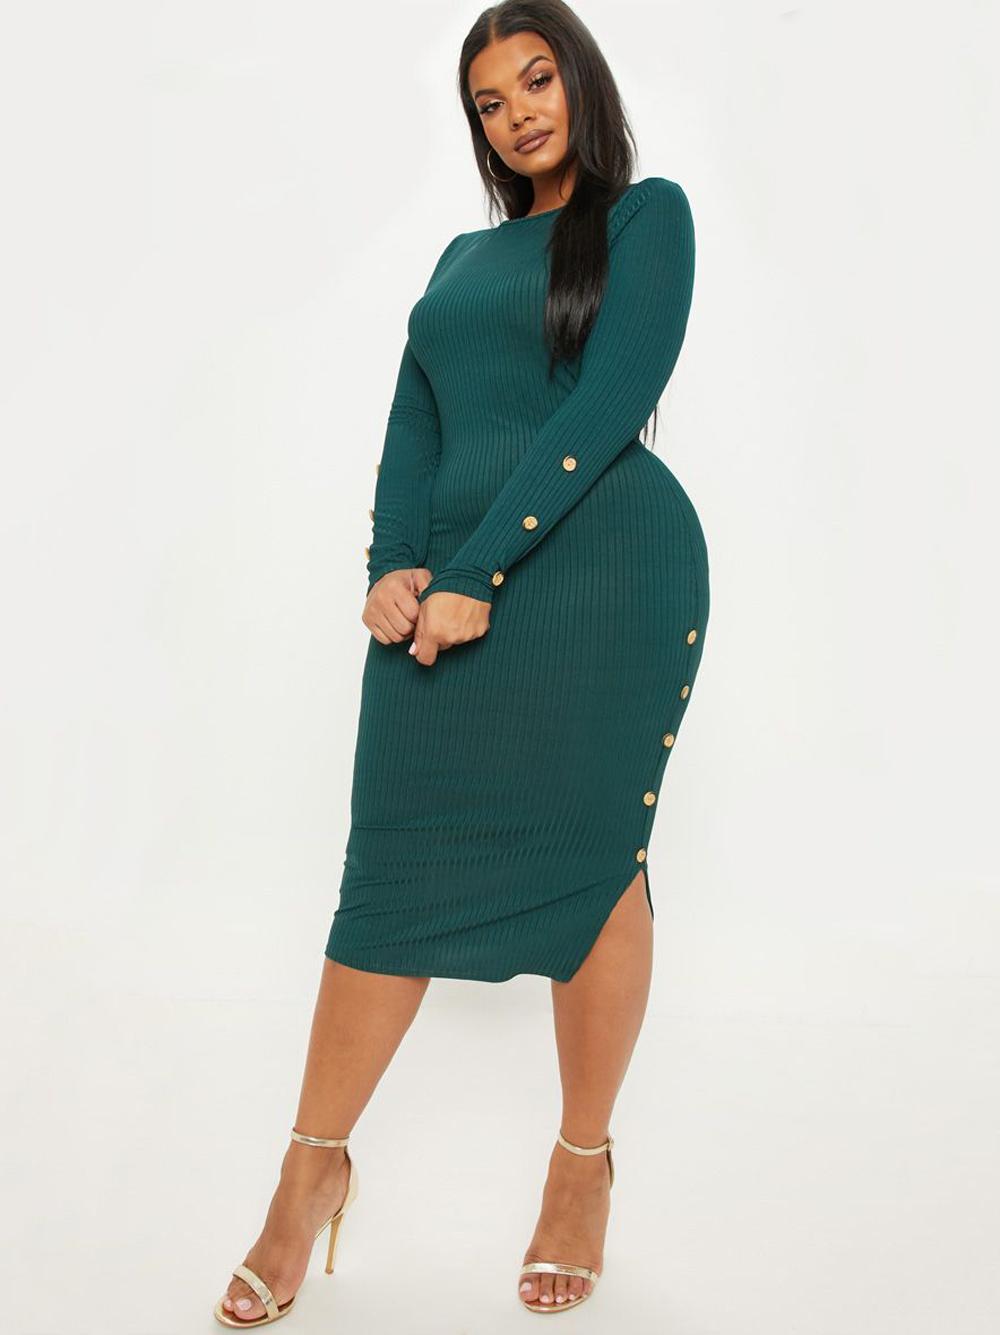 curvy-con-dress-12.jpg